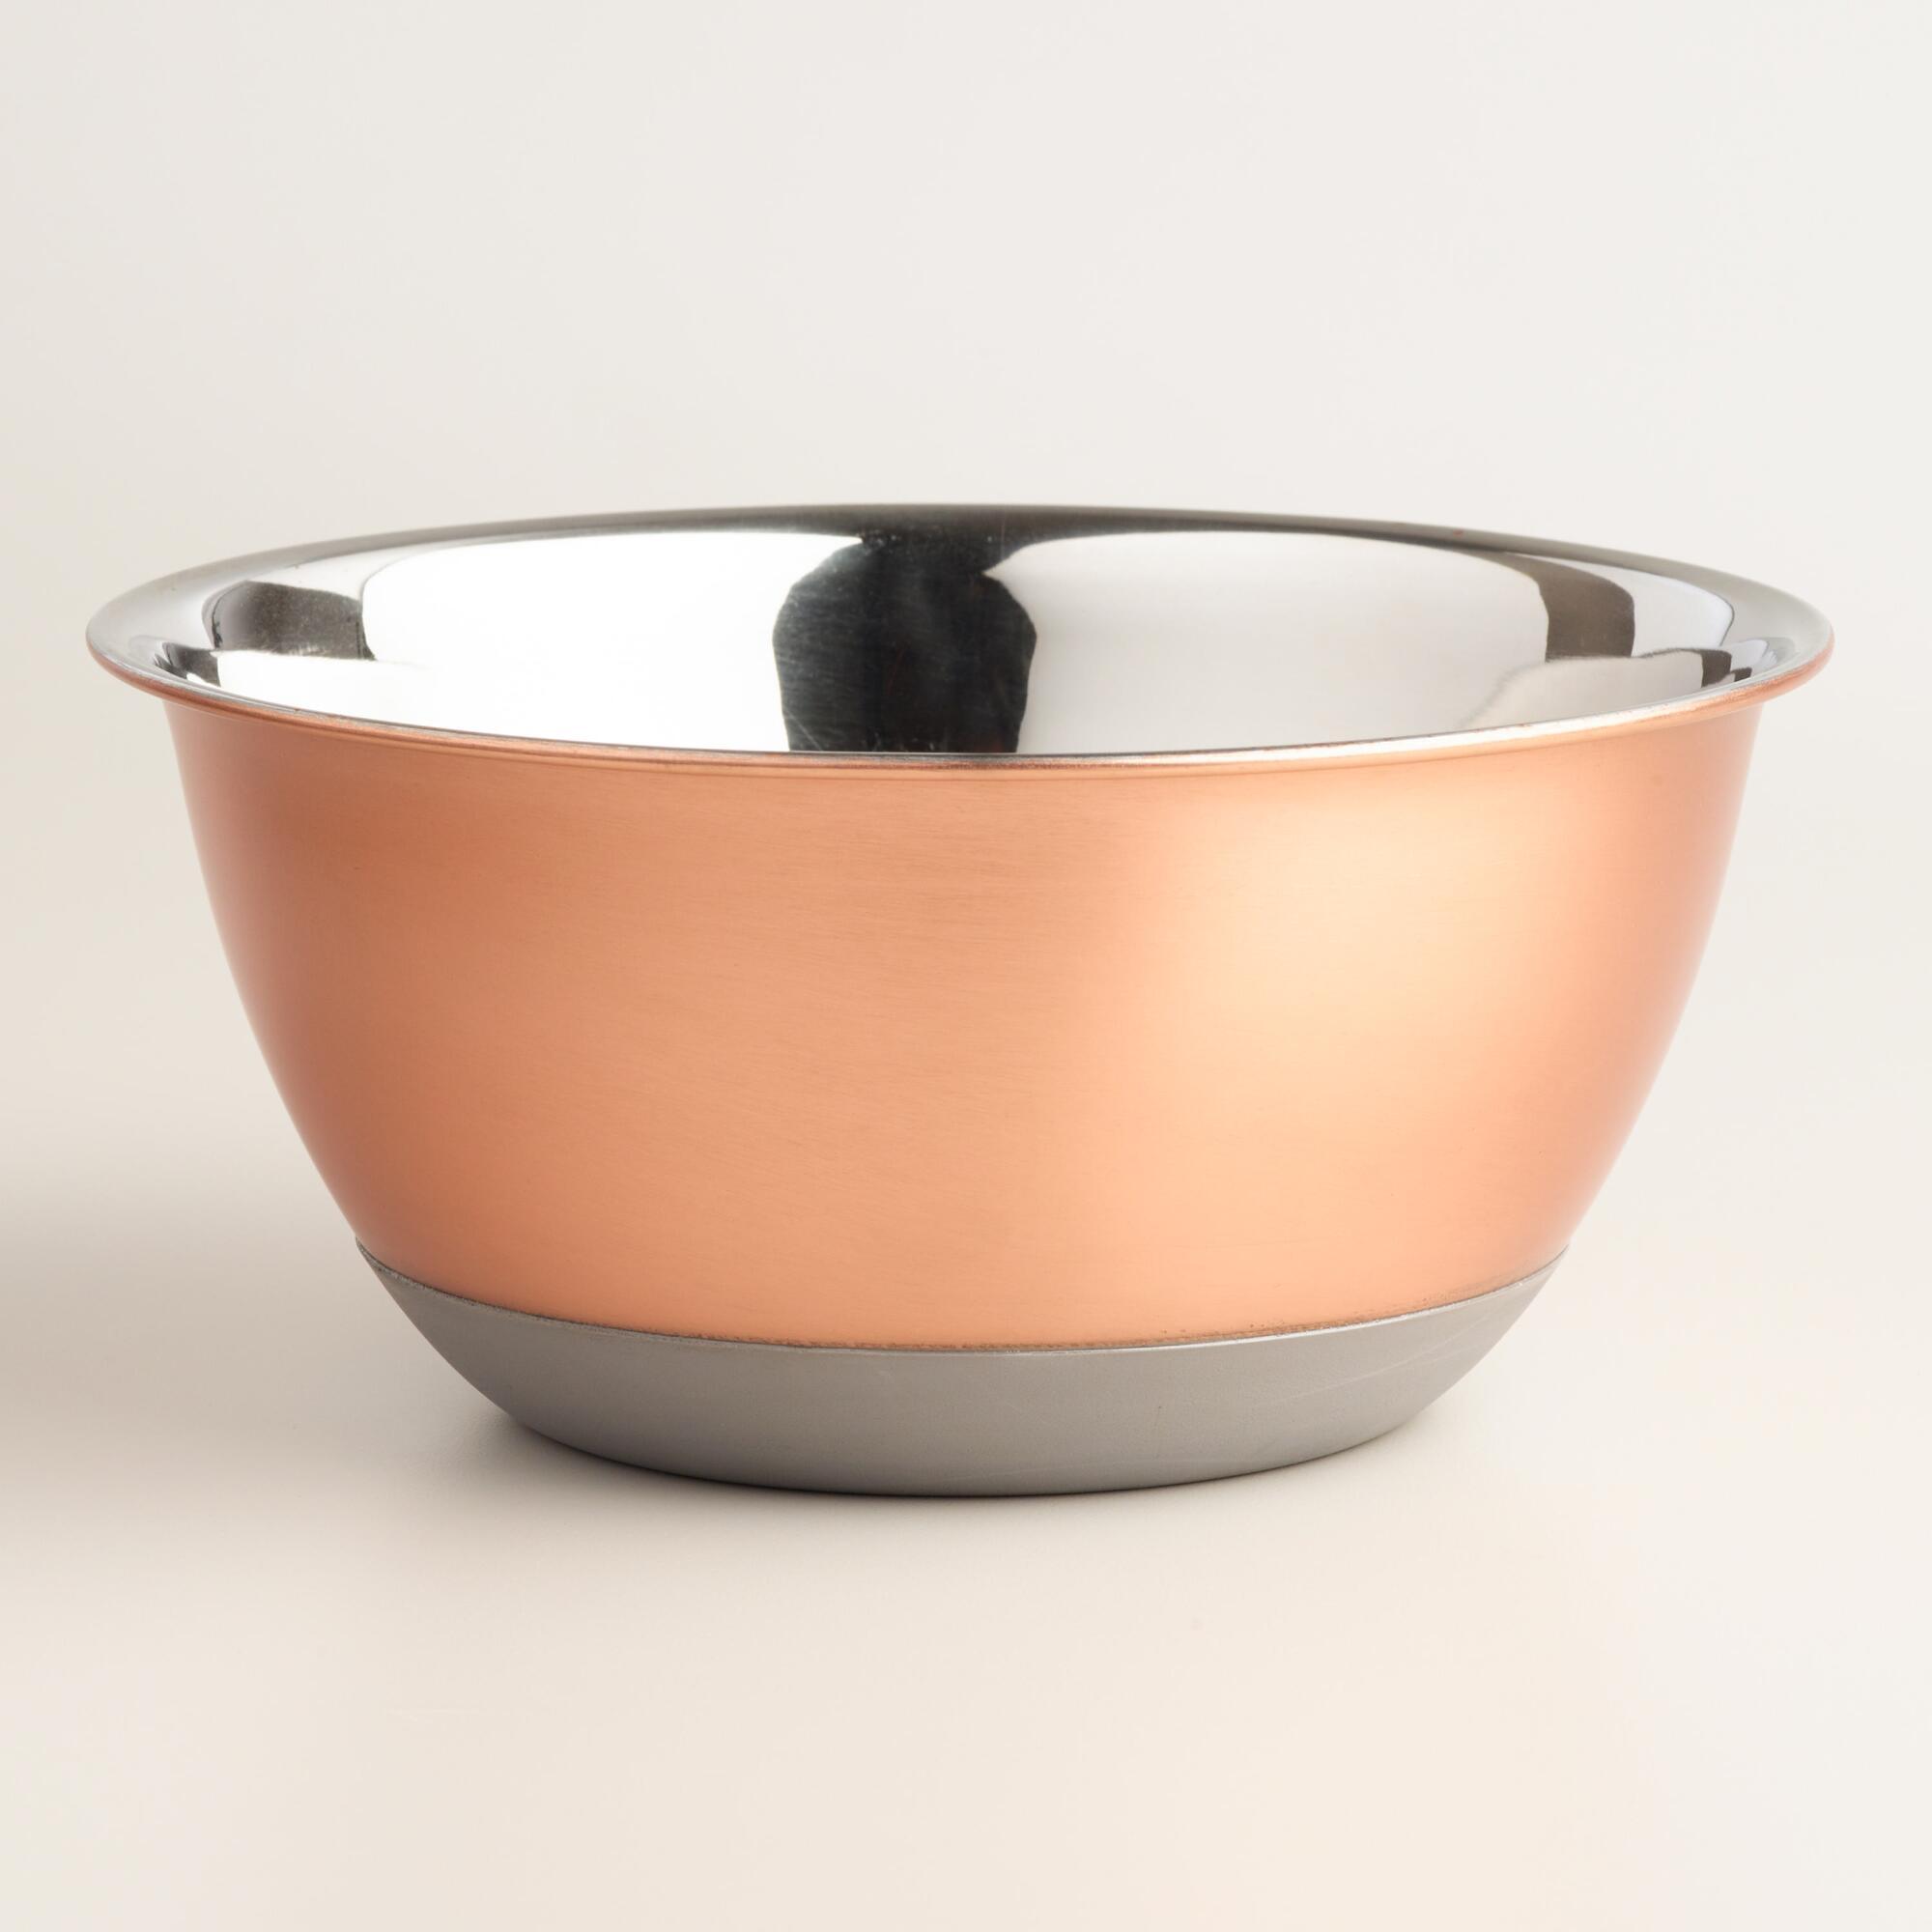 2 Quart Copper Nonskid Mixing Bowl | World Market